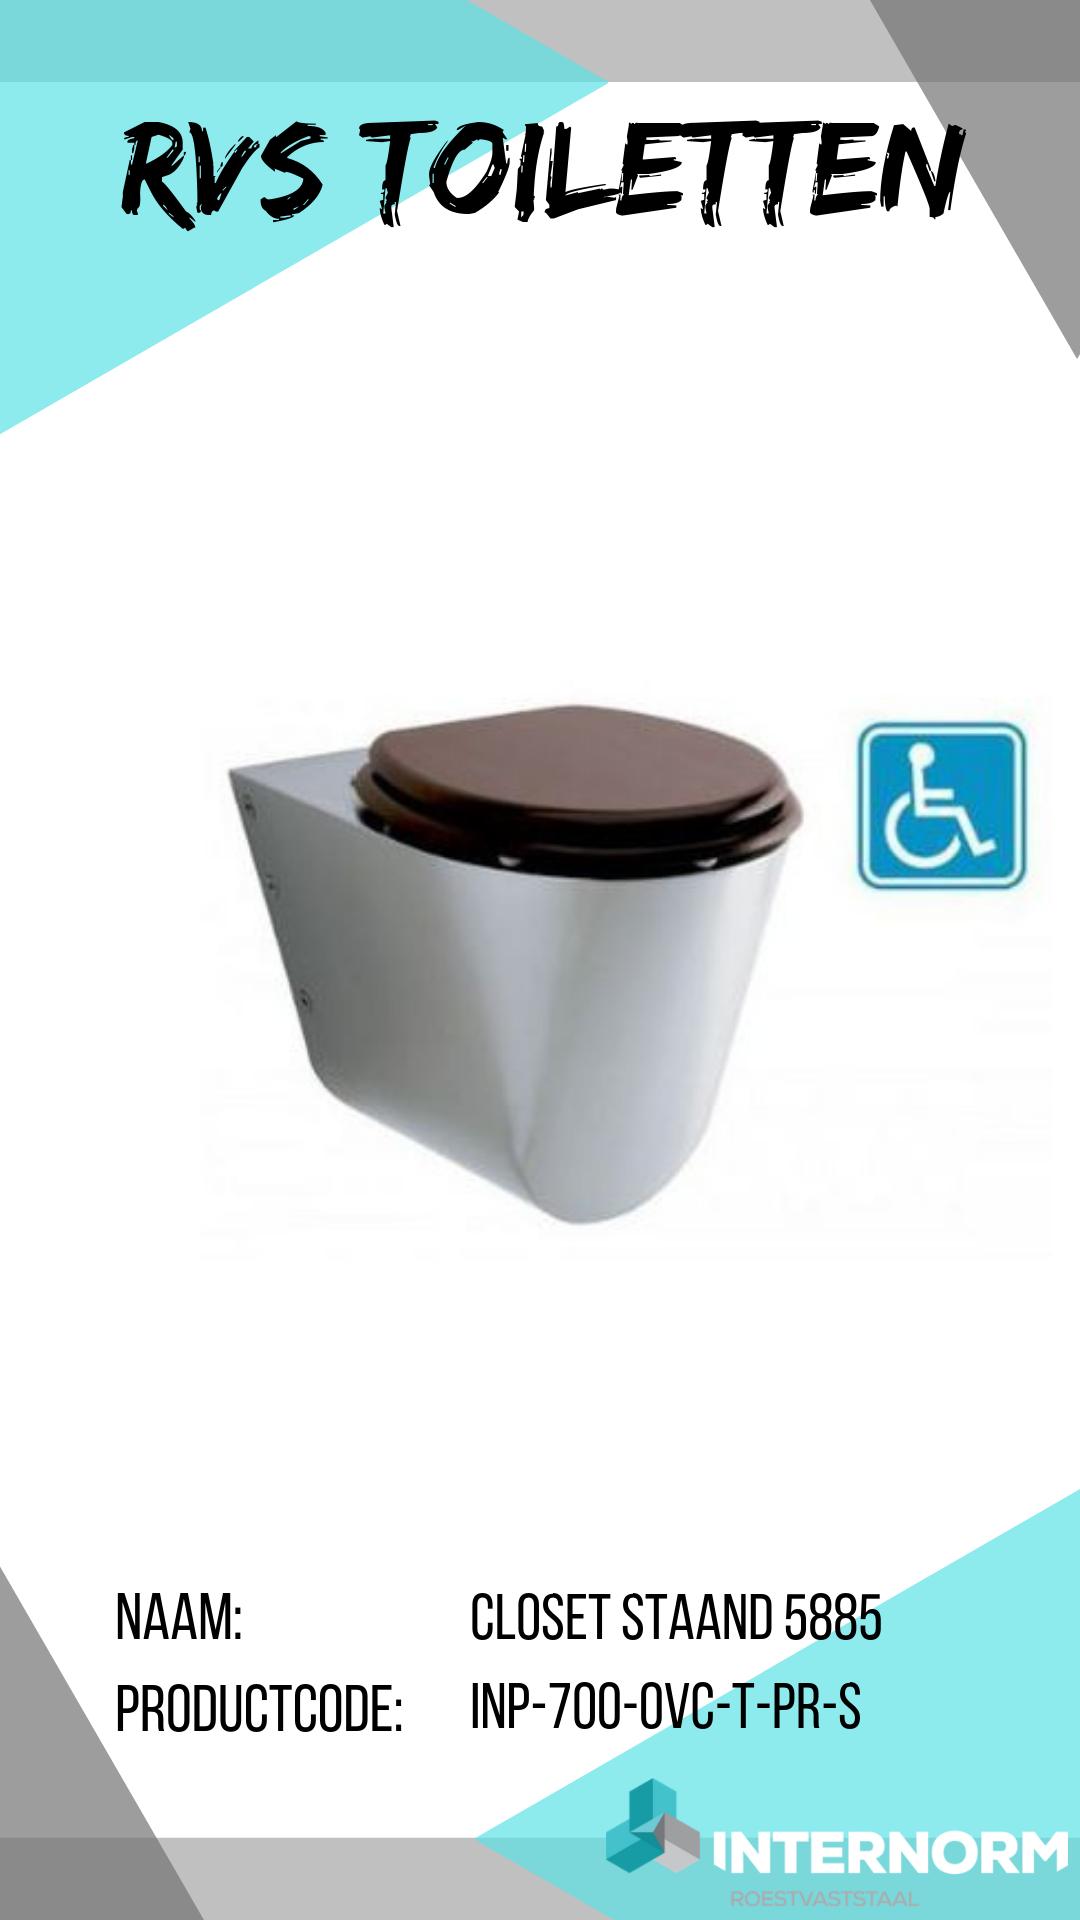 Astonishing Rvs Toilet Vloerstaand Miva Met Serviceluik De Inp 700 Ovc Theyellowbook Wood Chair Design Ideas Theyellowbookinfo